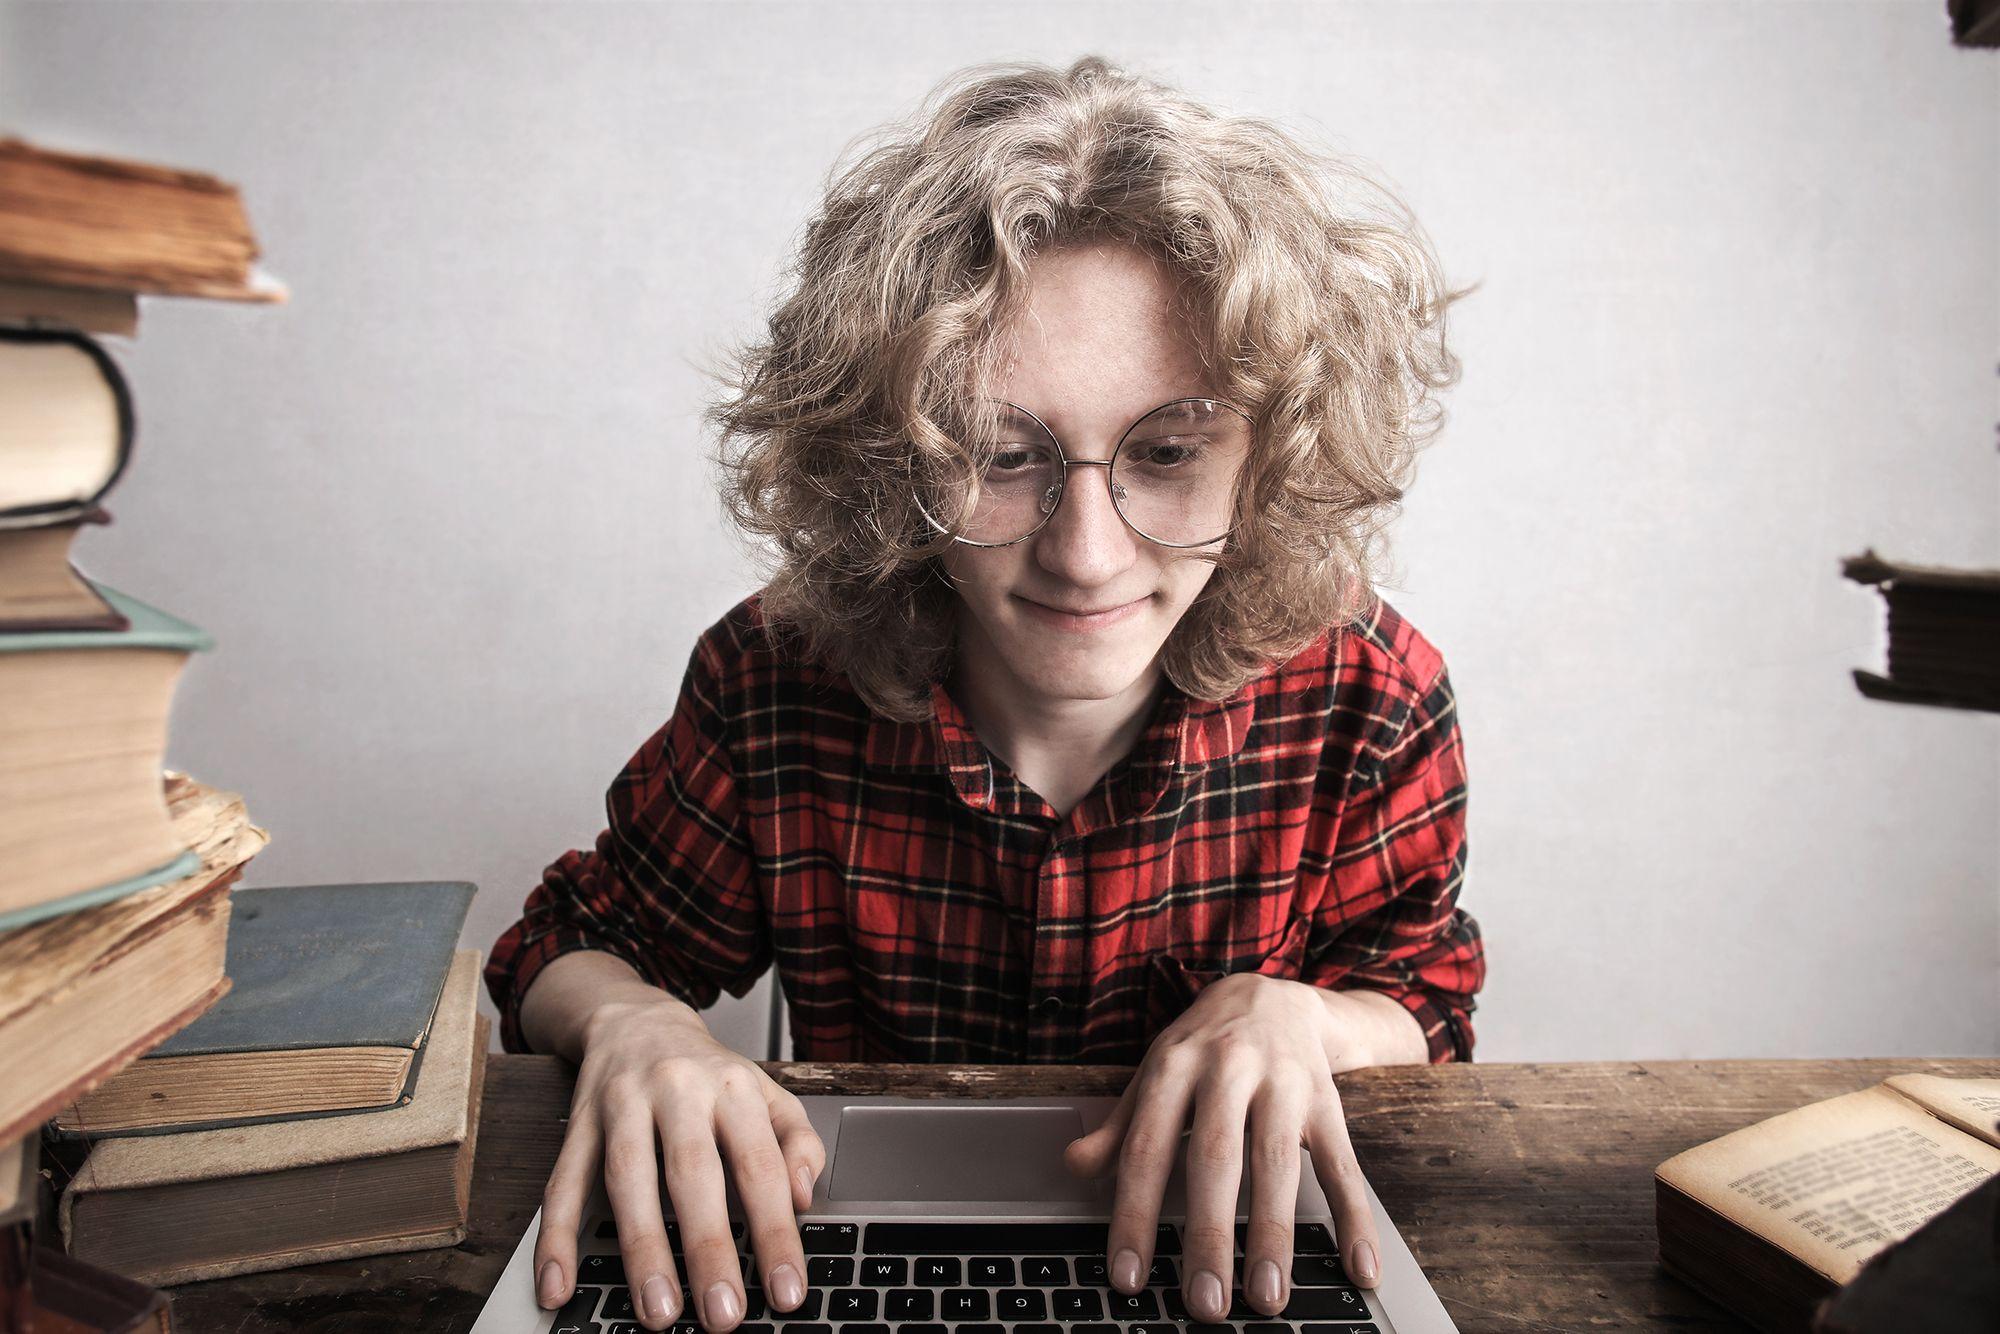 Man writing notes on his laptop